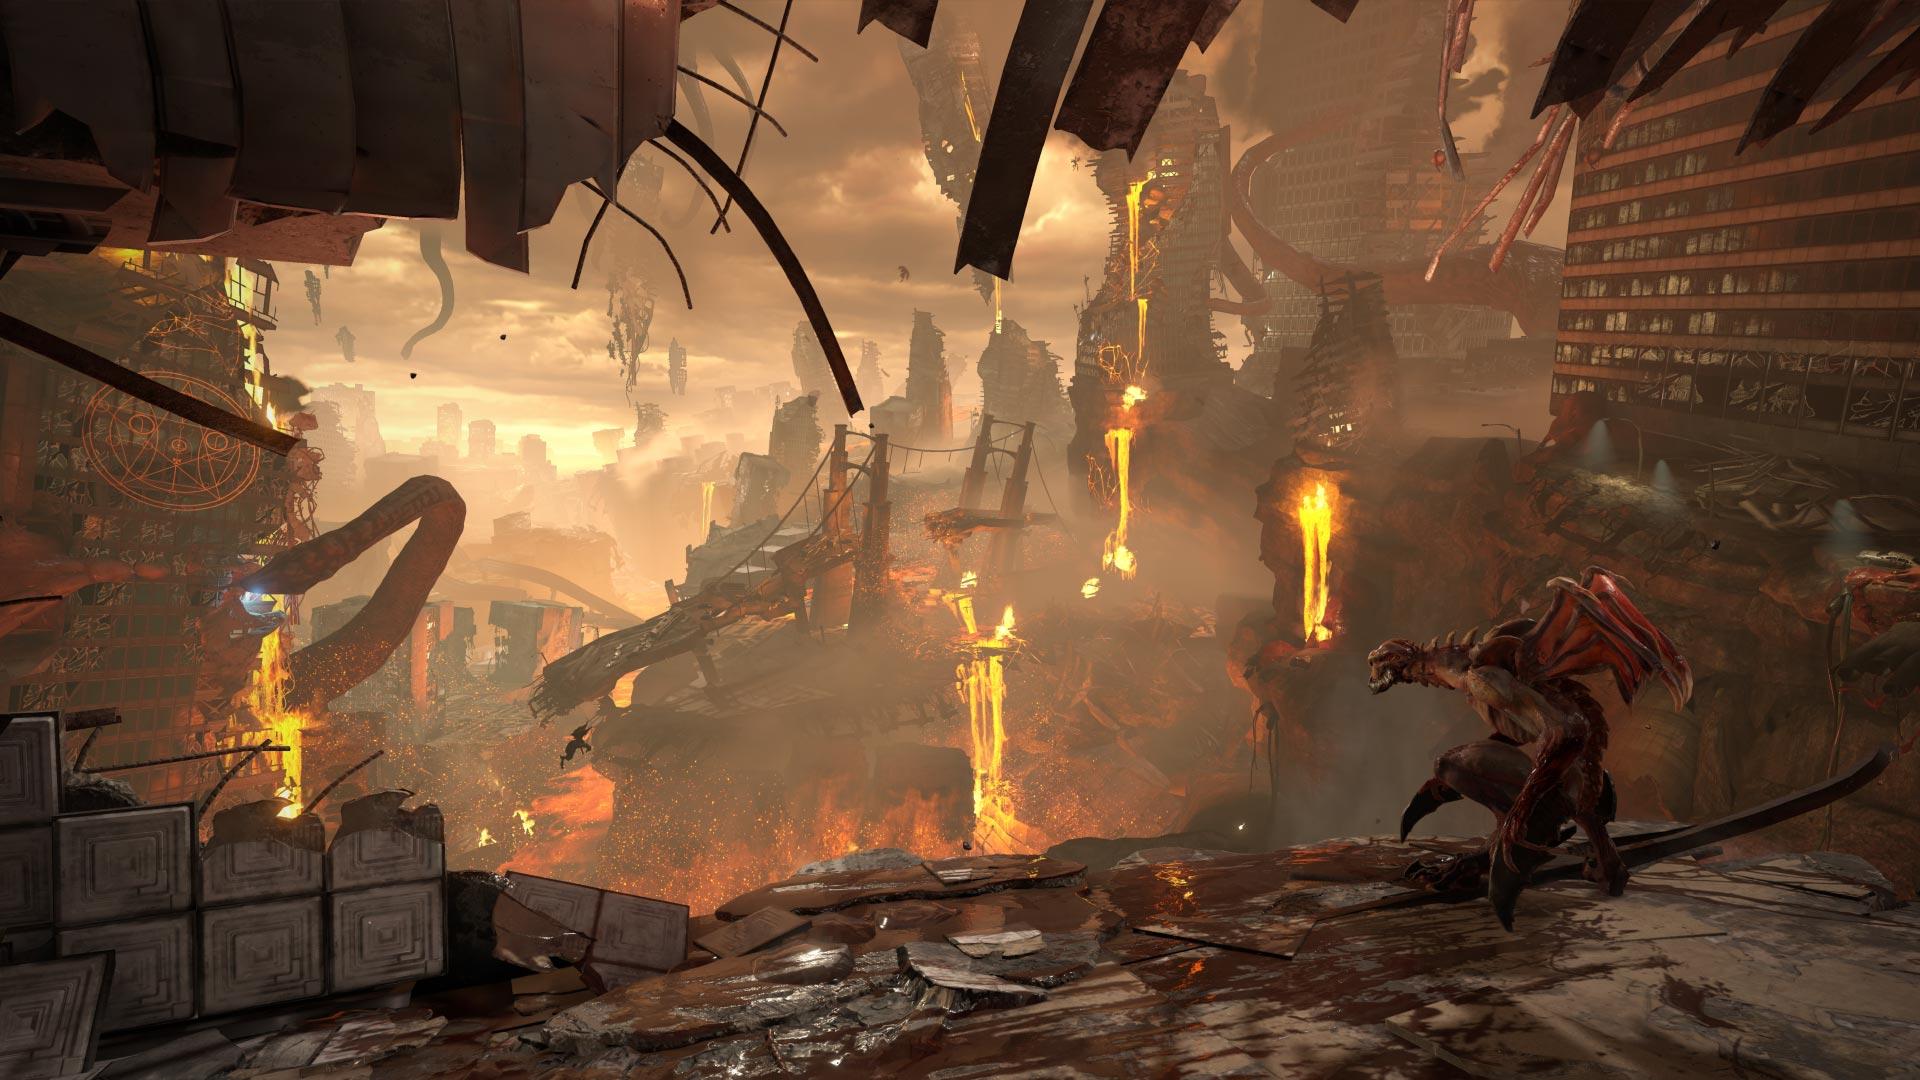 The world of Doom: Eternal